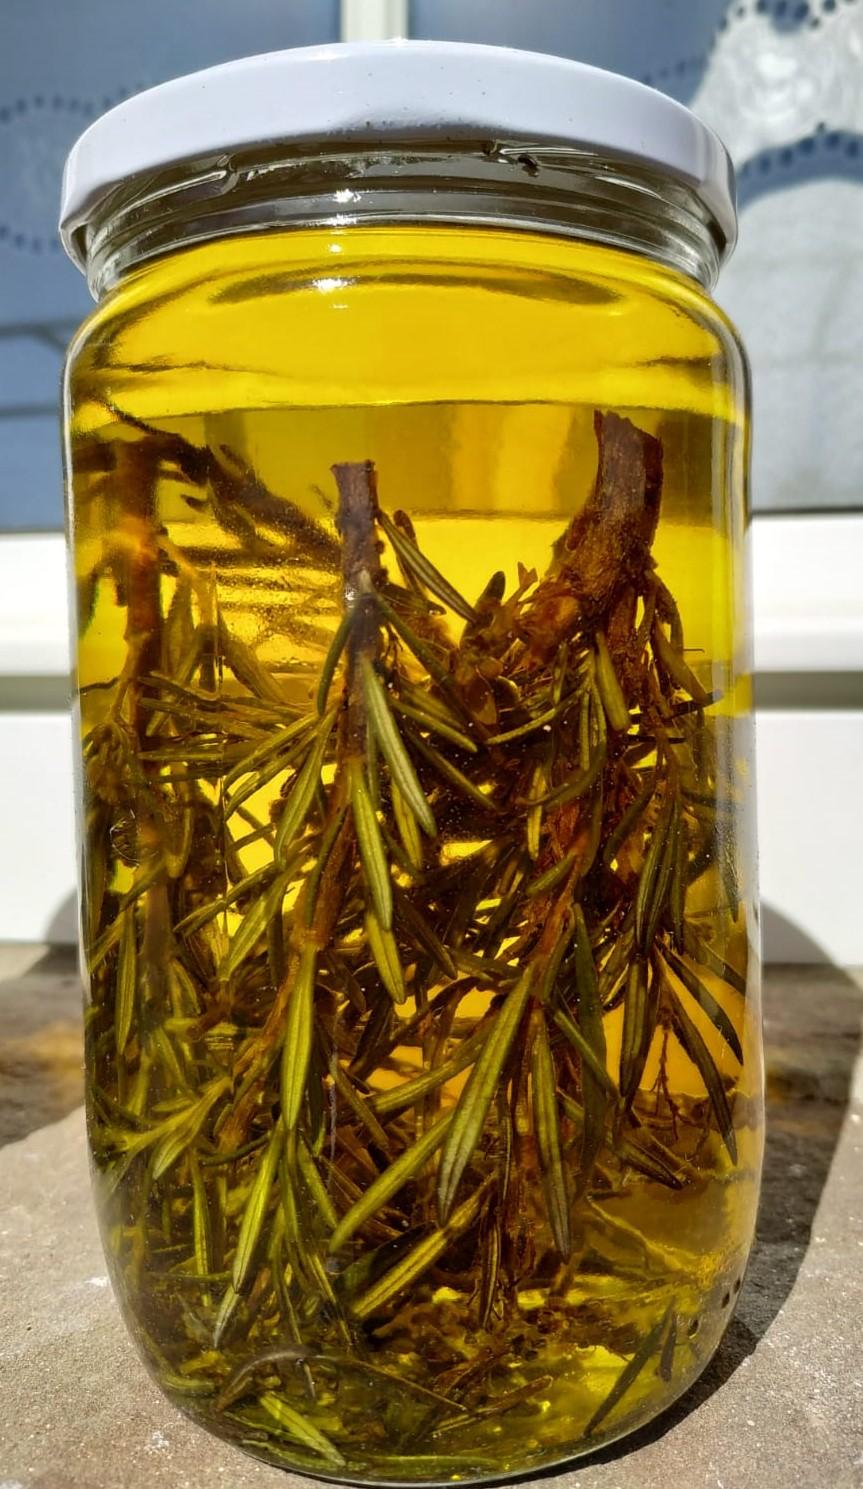 romero macerado aceite jabon castilla